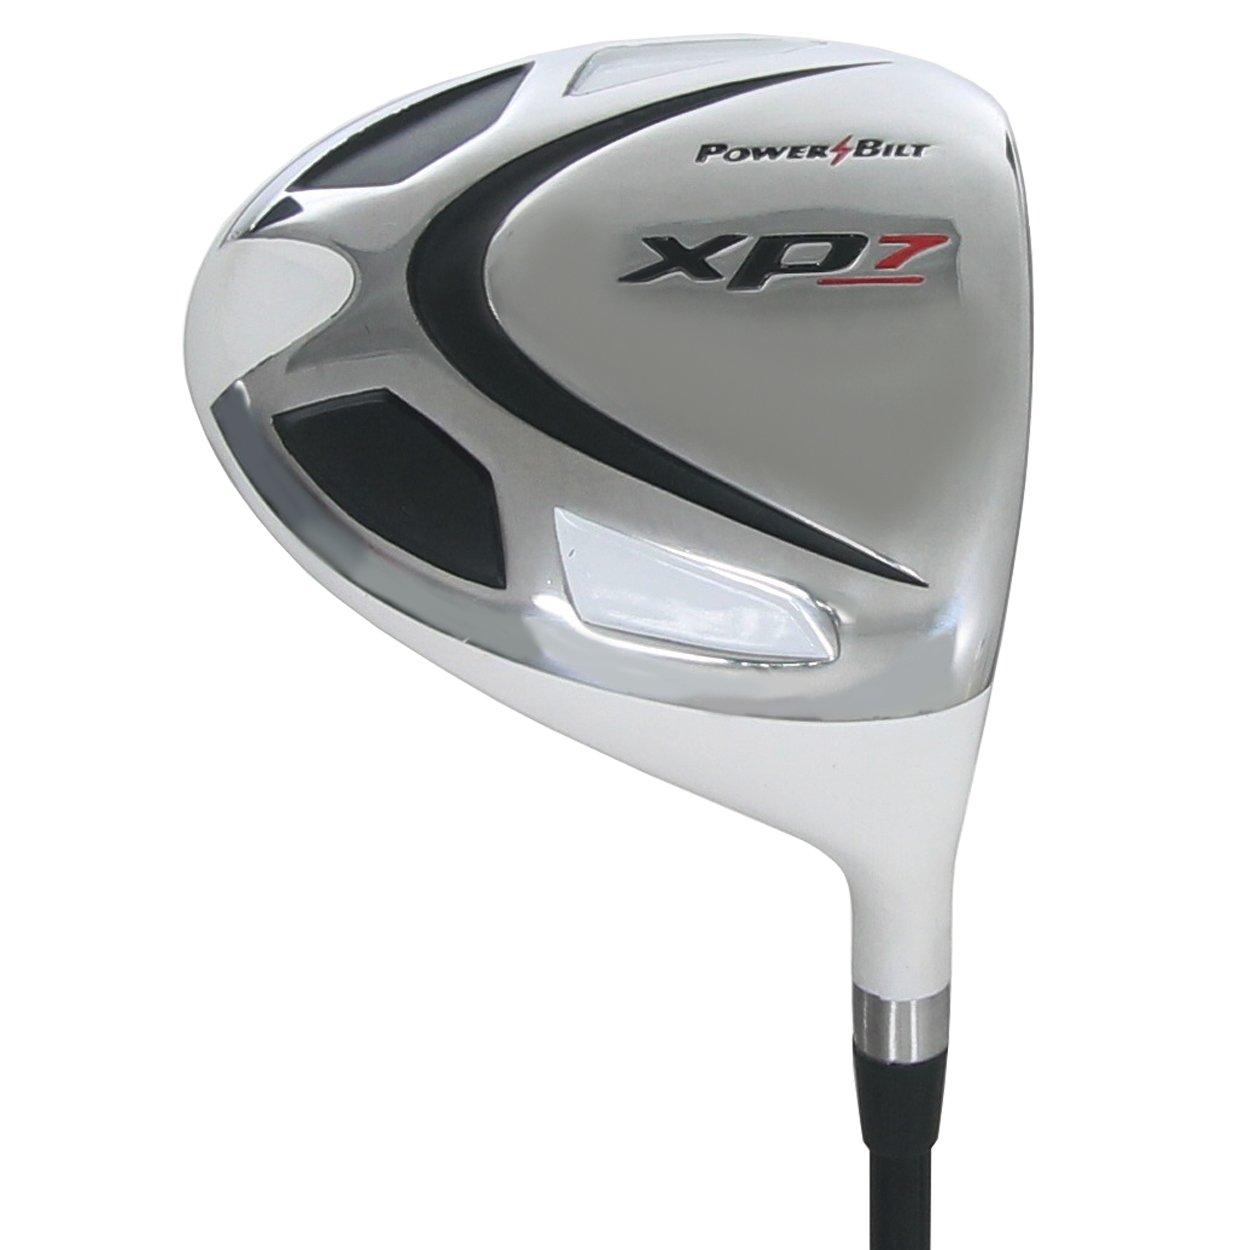 Powerbilt Golf Clubs XP7 White Driver 10.5 Graphite Stiff Flex